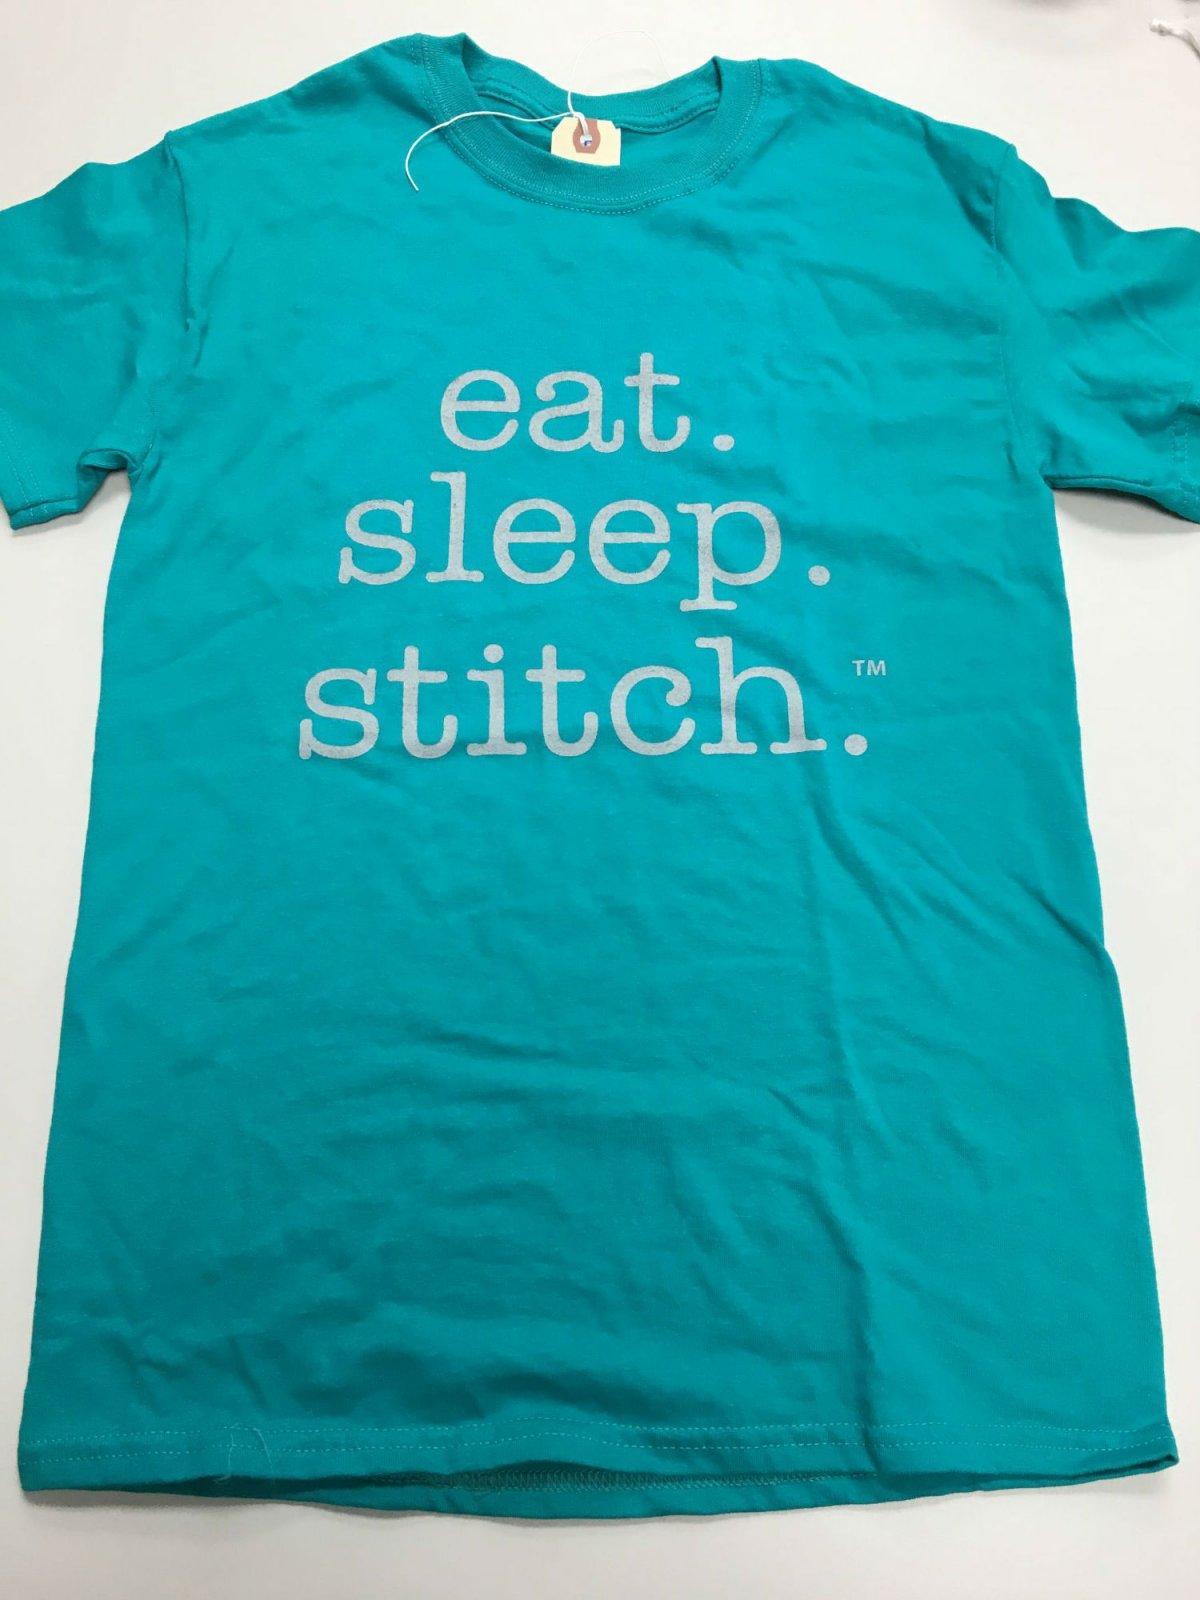 eat sleep stitch t shirt sz. S teal